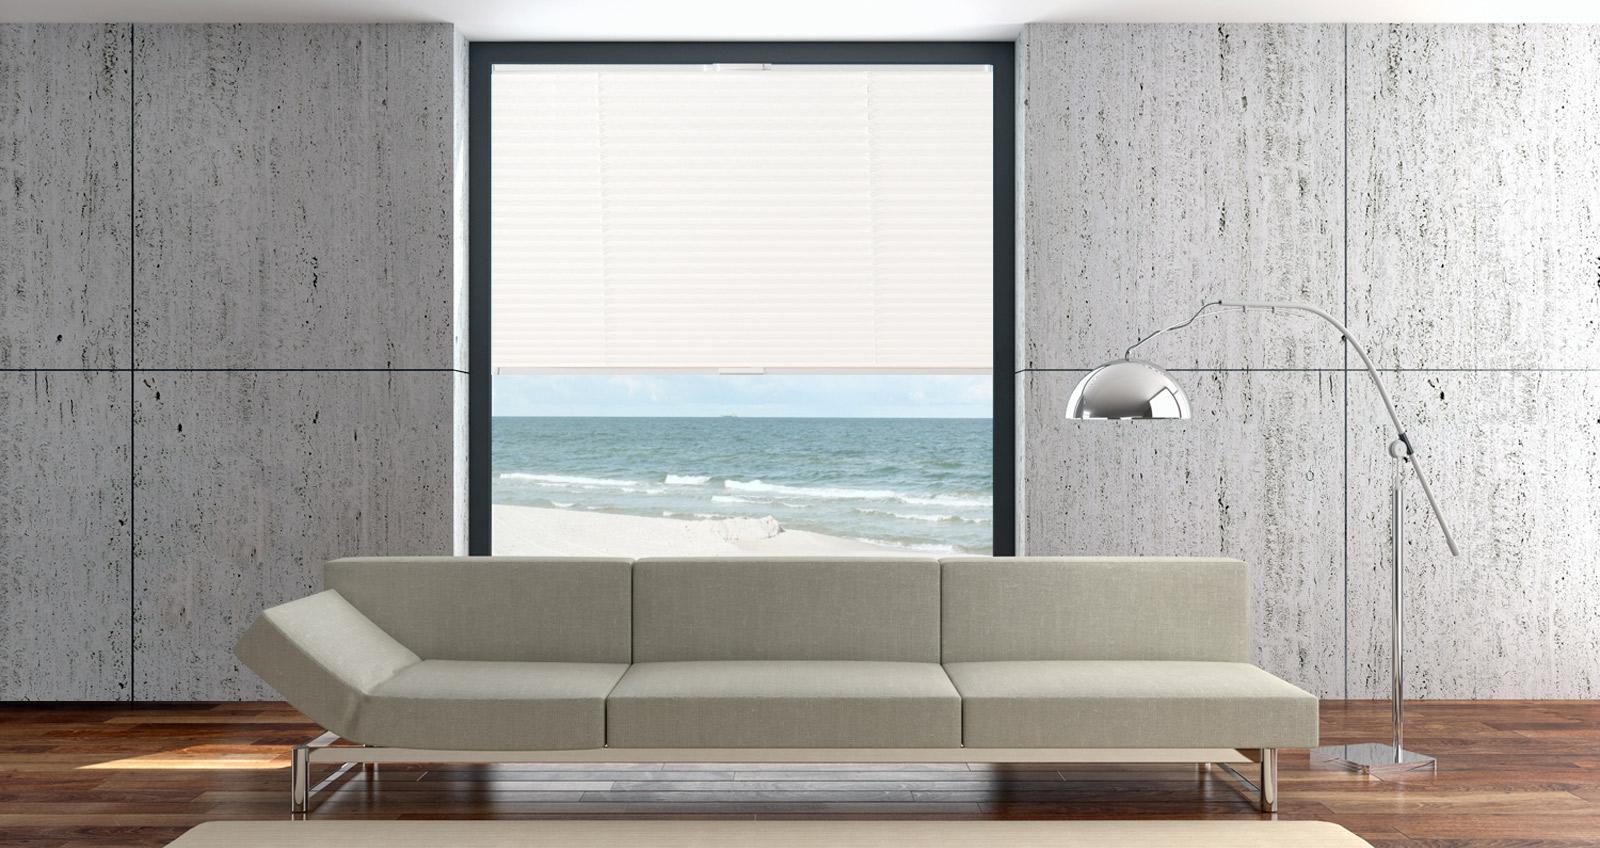 plissee gnstig kaufen good plissees gnstiger bis zu. Black Bedroom Furniture Sets. Home Design Ideas